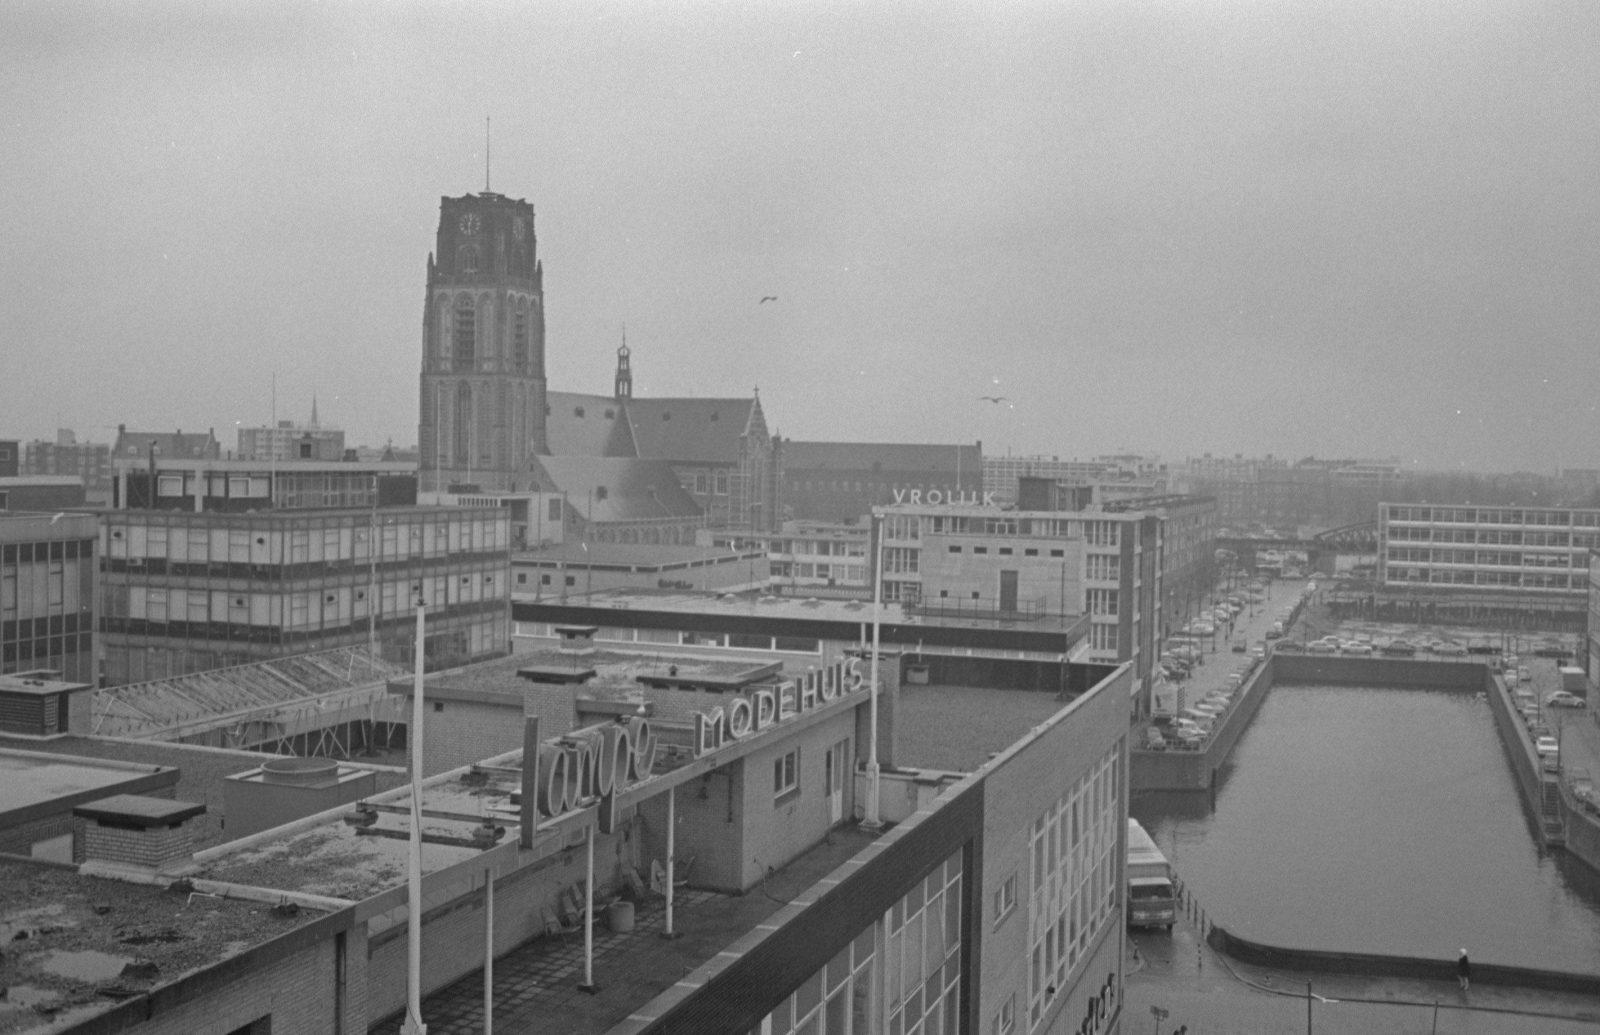 Uitzicht op Laurenskerk Hoogstraat en Steigersgracht_NL Rt SA 4121 21665 2 34